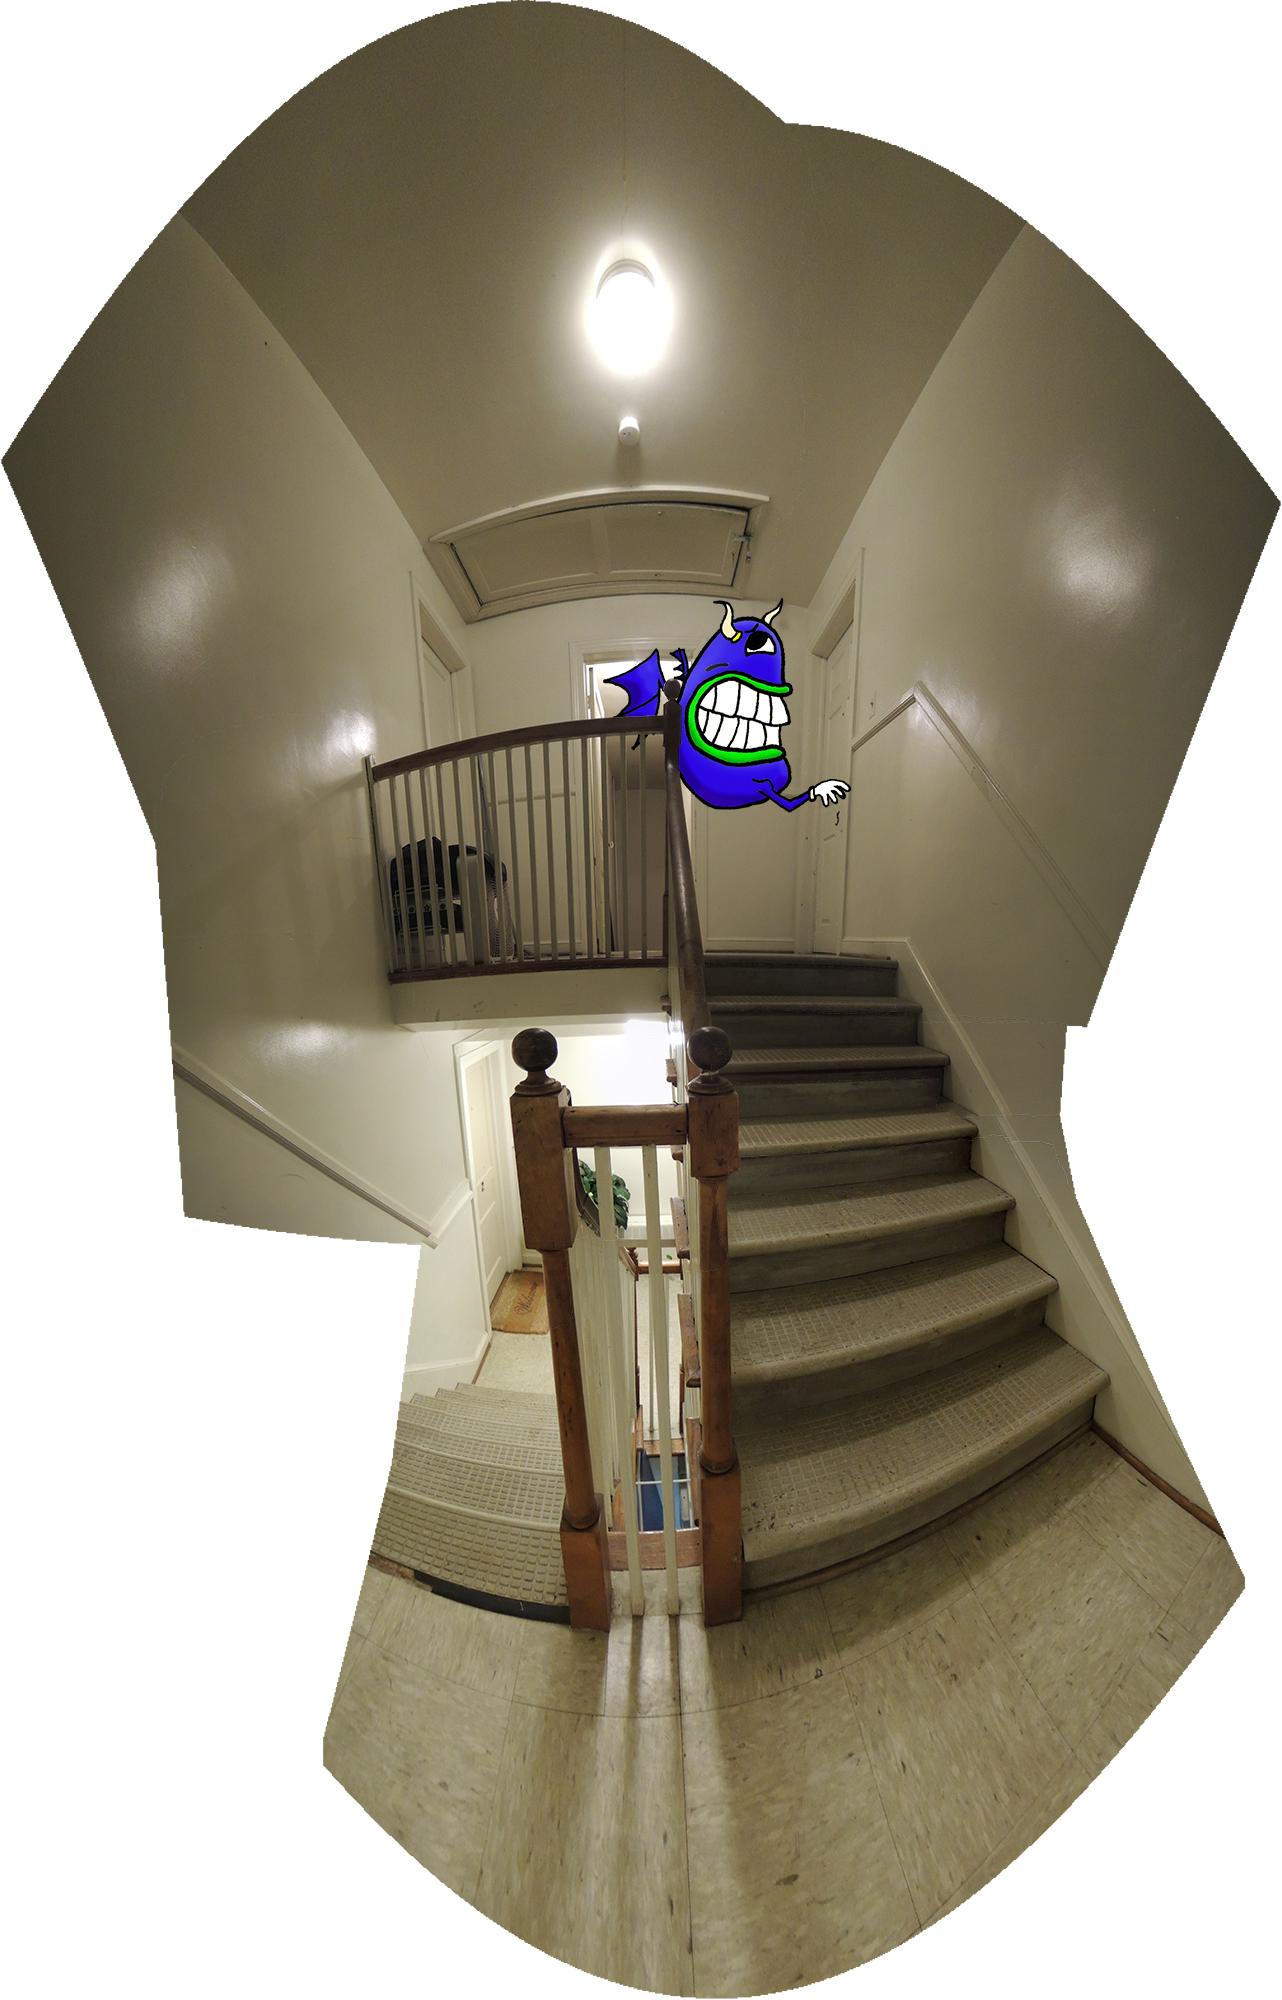 Stairs_Panorama1